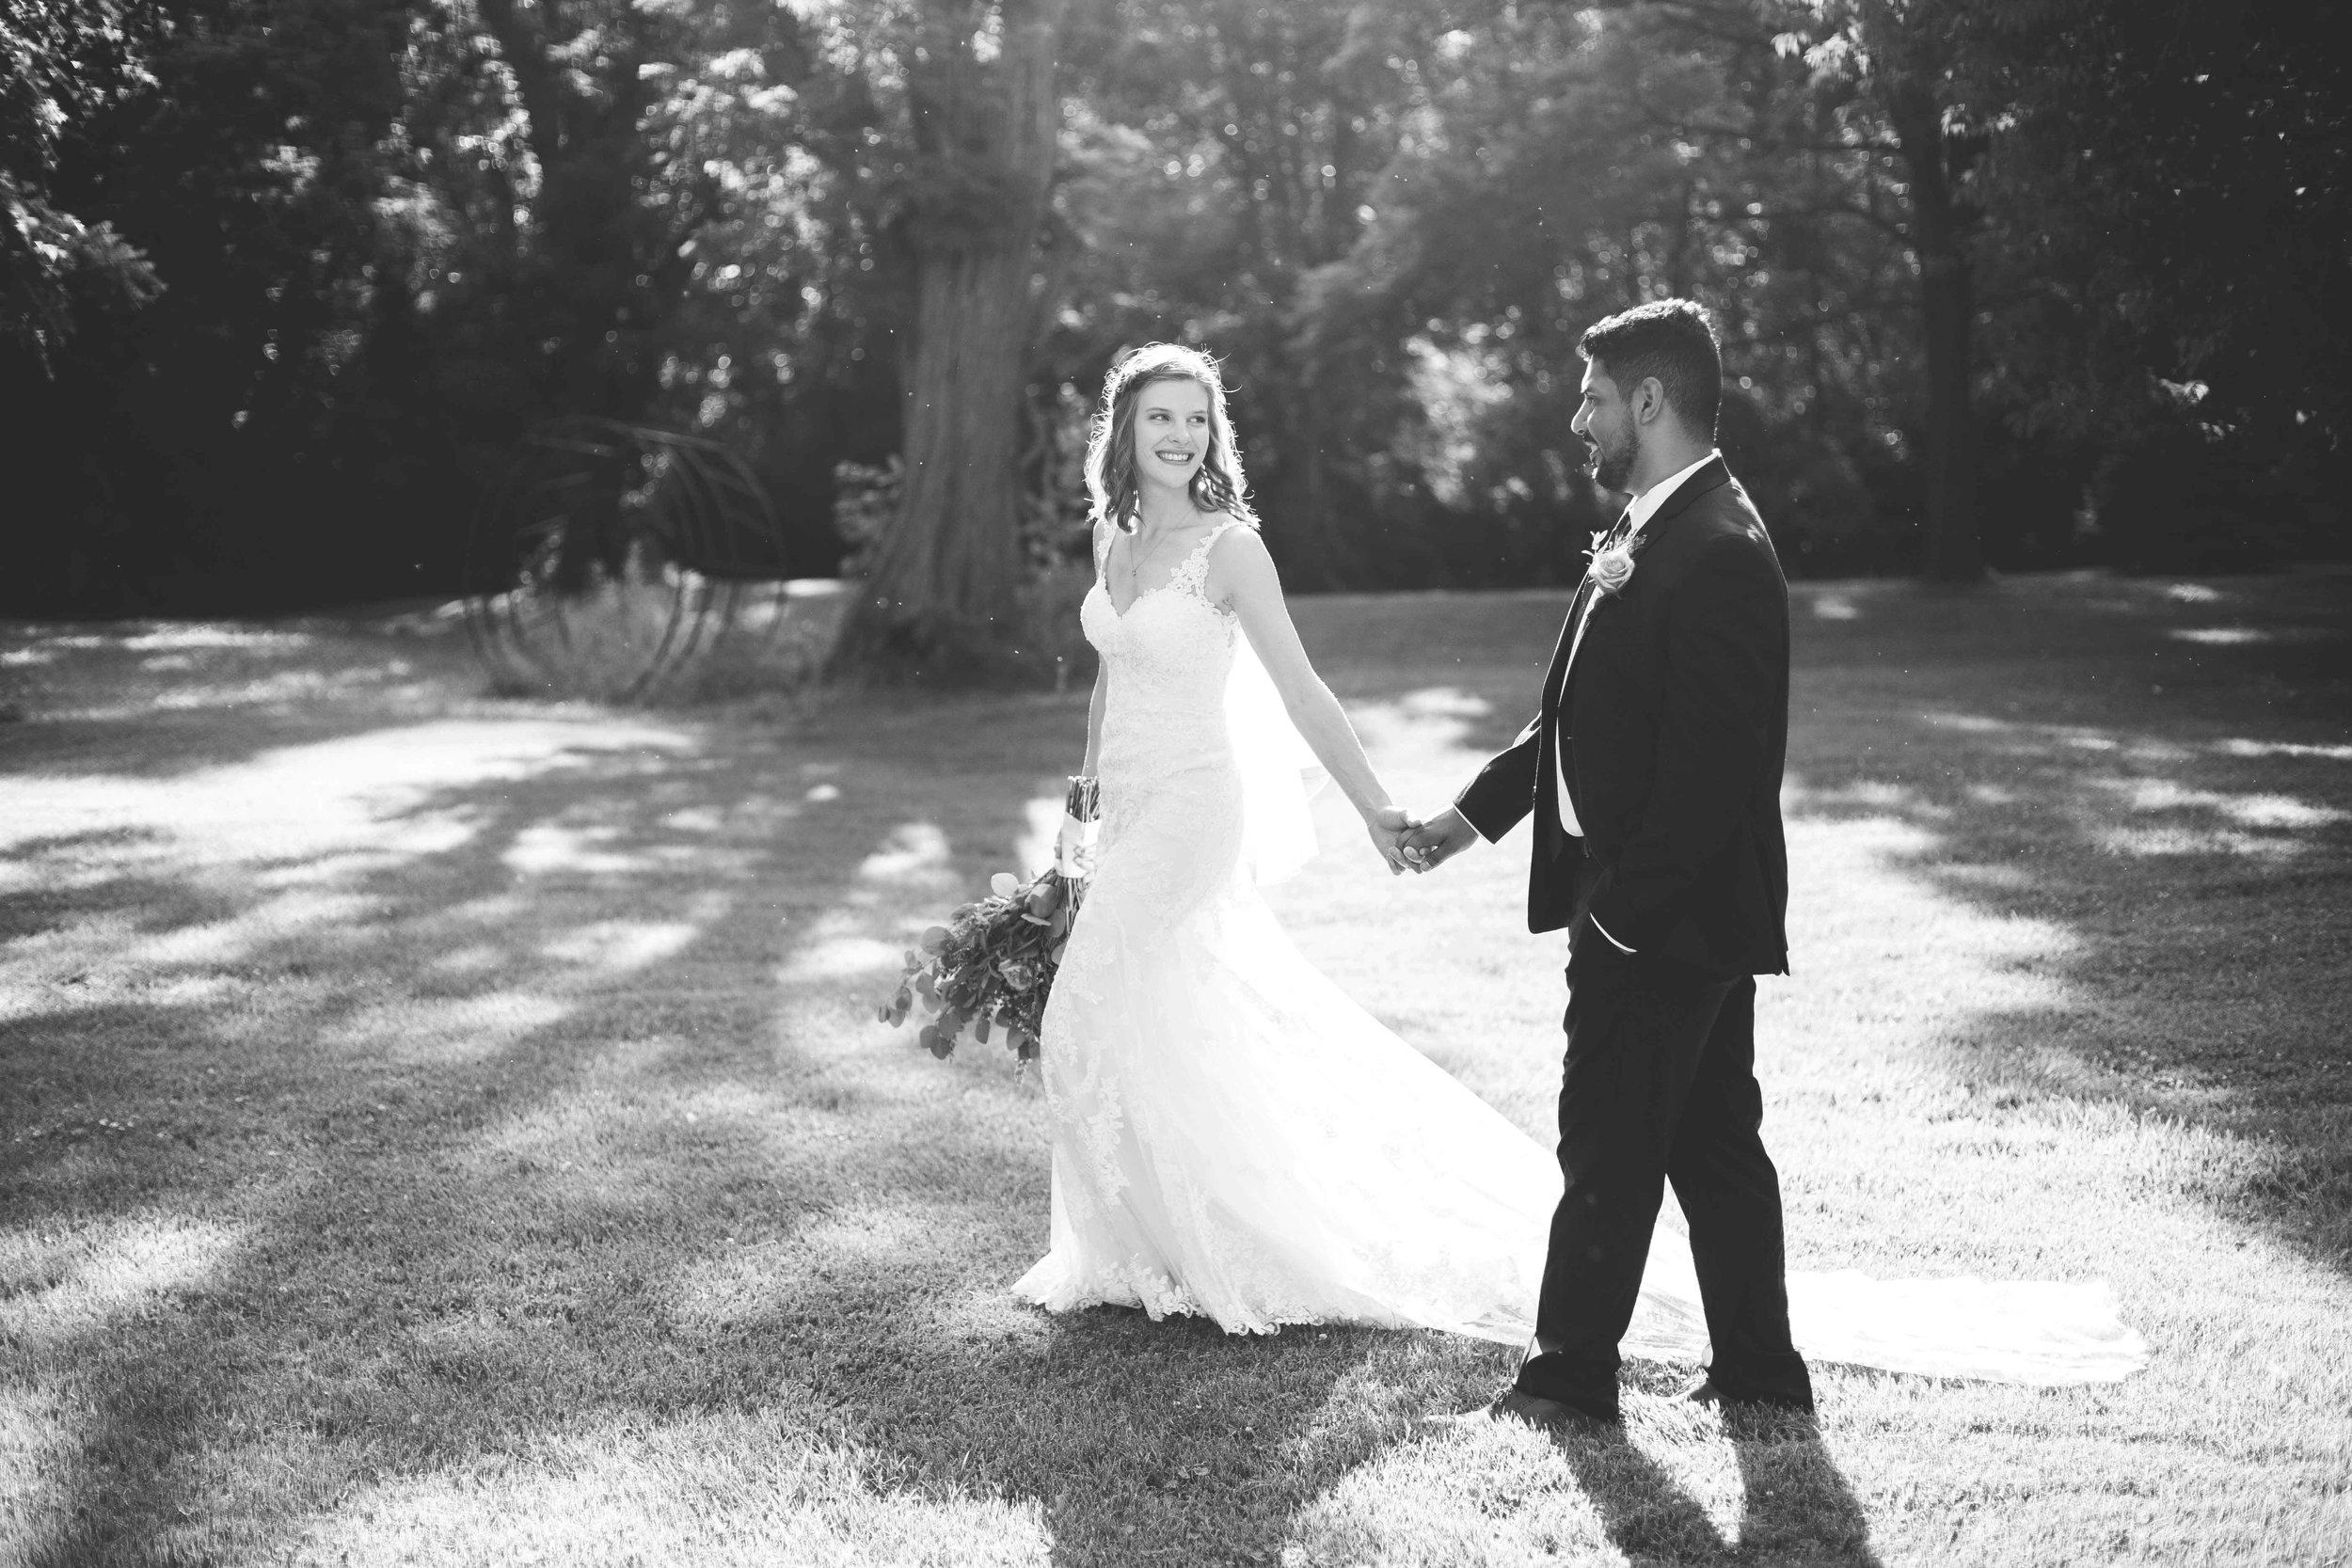 ee cincinnati wedding photographer brideandgroom0003.jpg